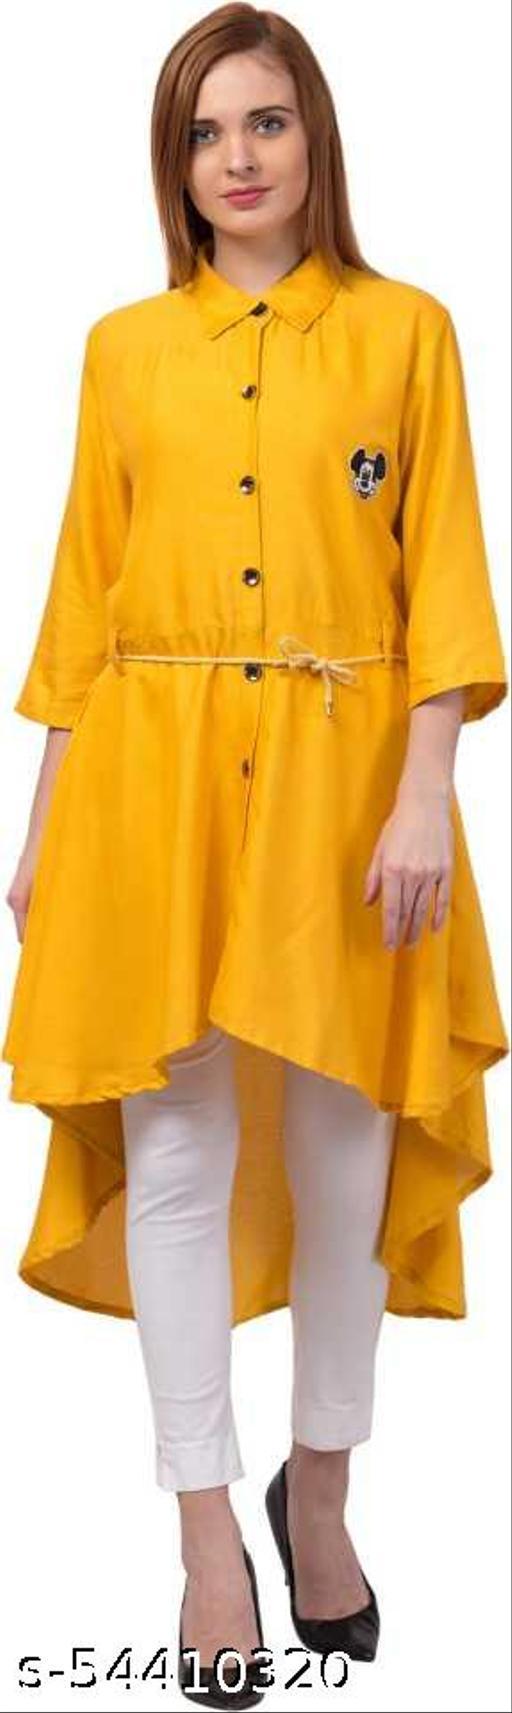 Alexa India Women High Low Yellow Dress